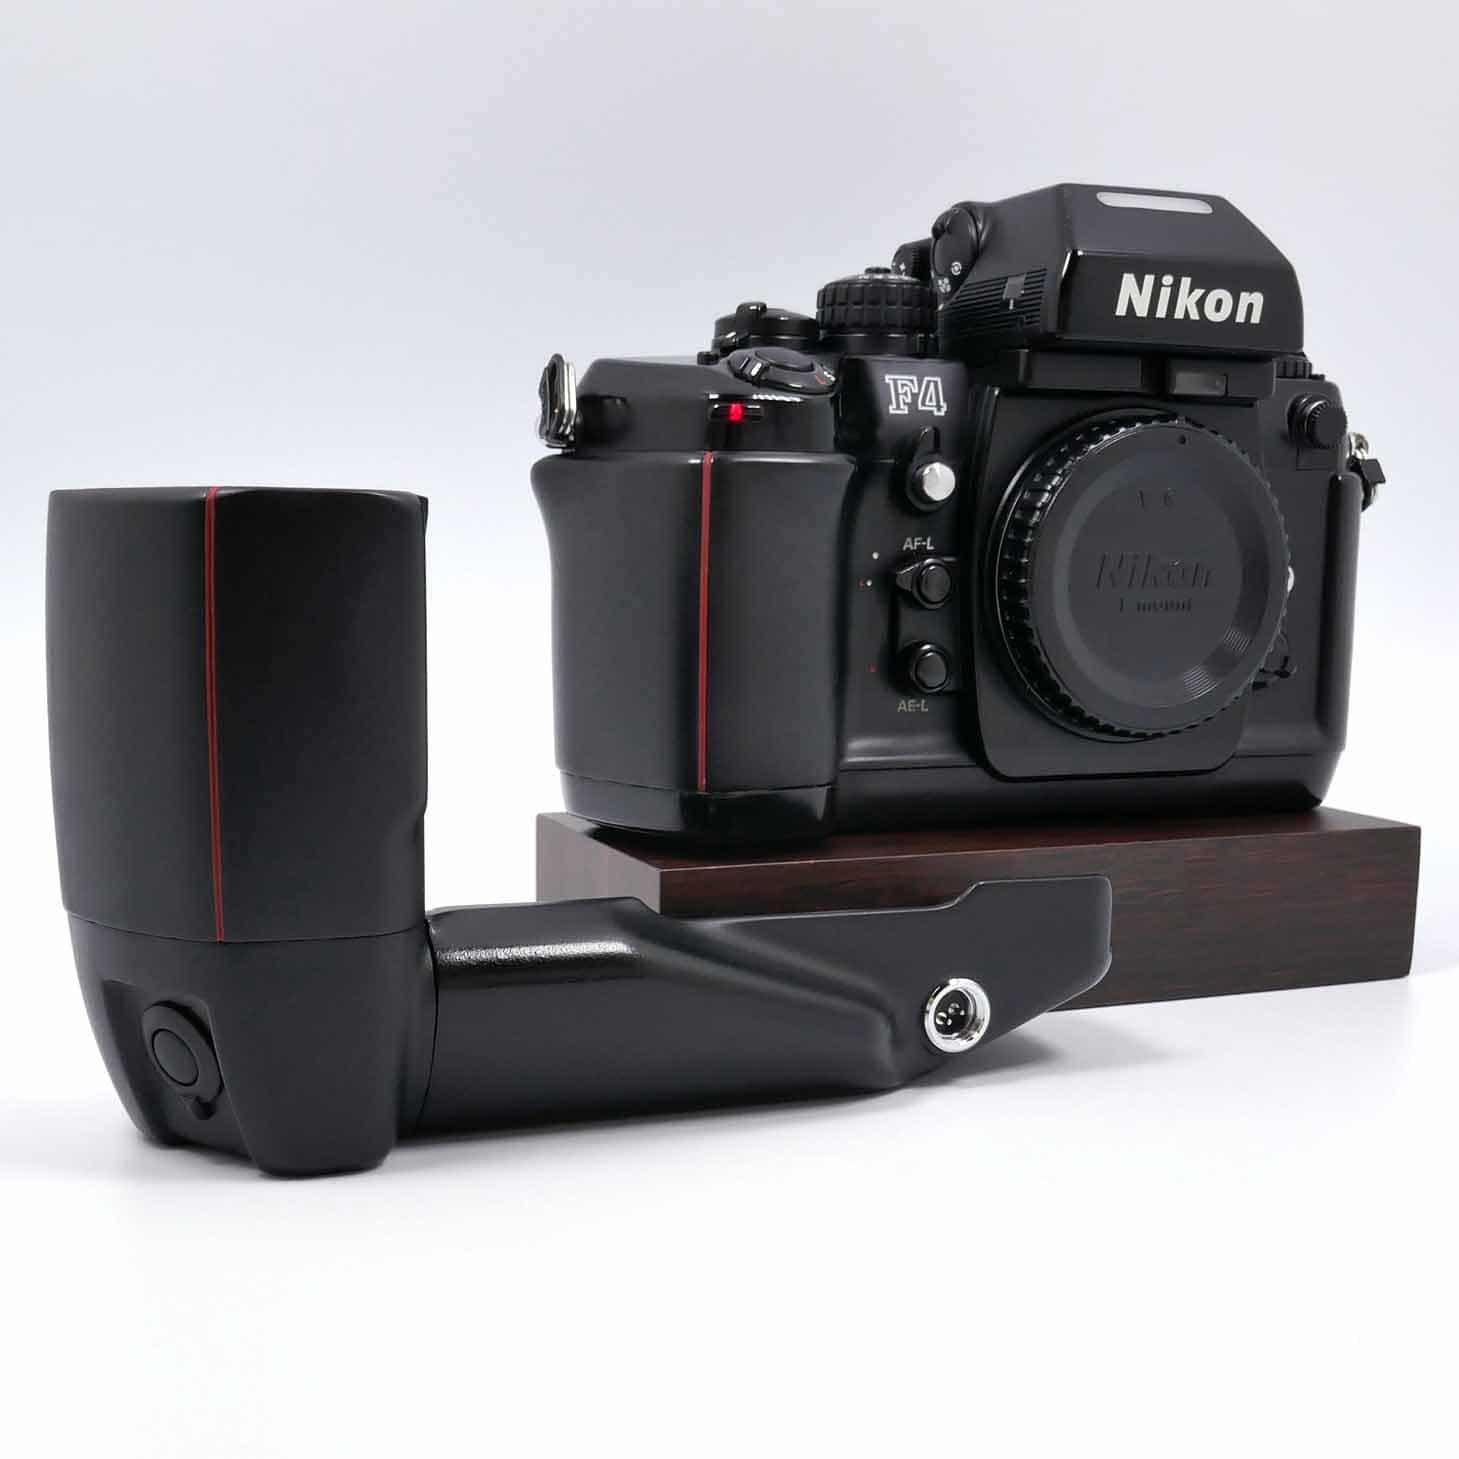 clean-cameras-Nikon-F4-+Nikon--MB-21-03